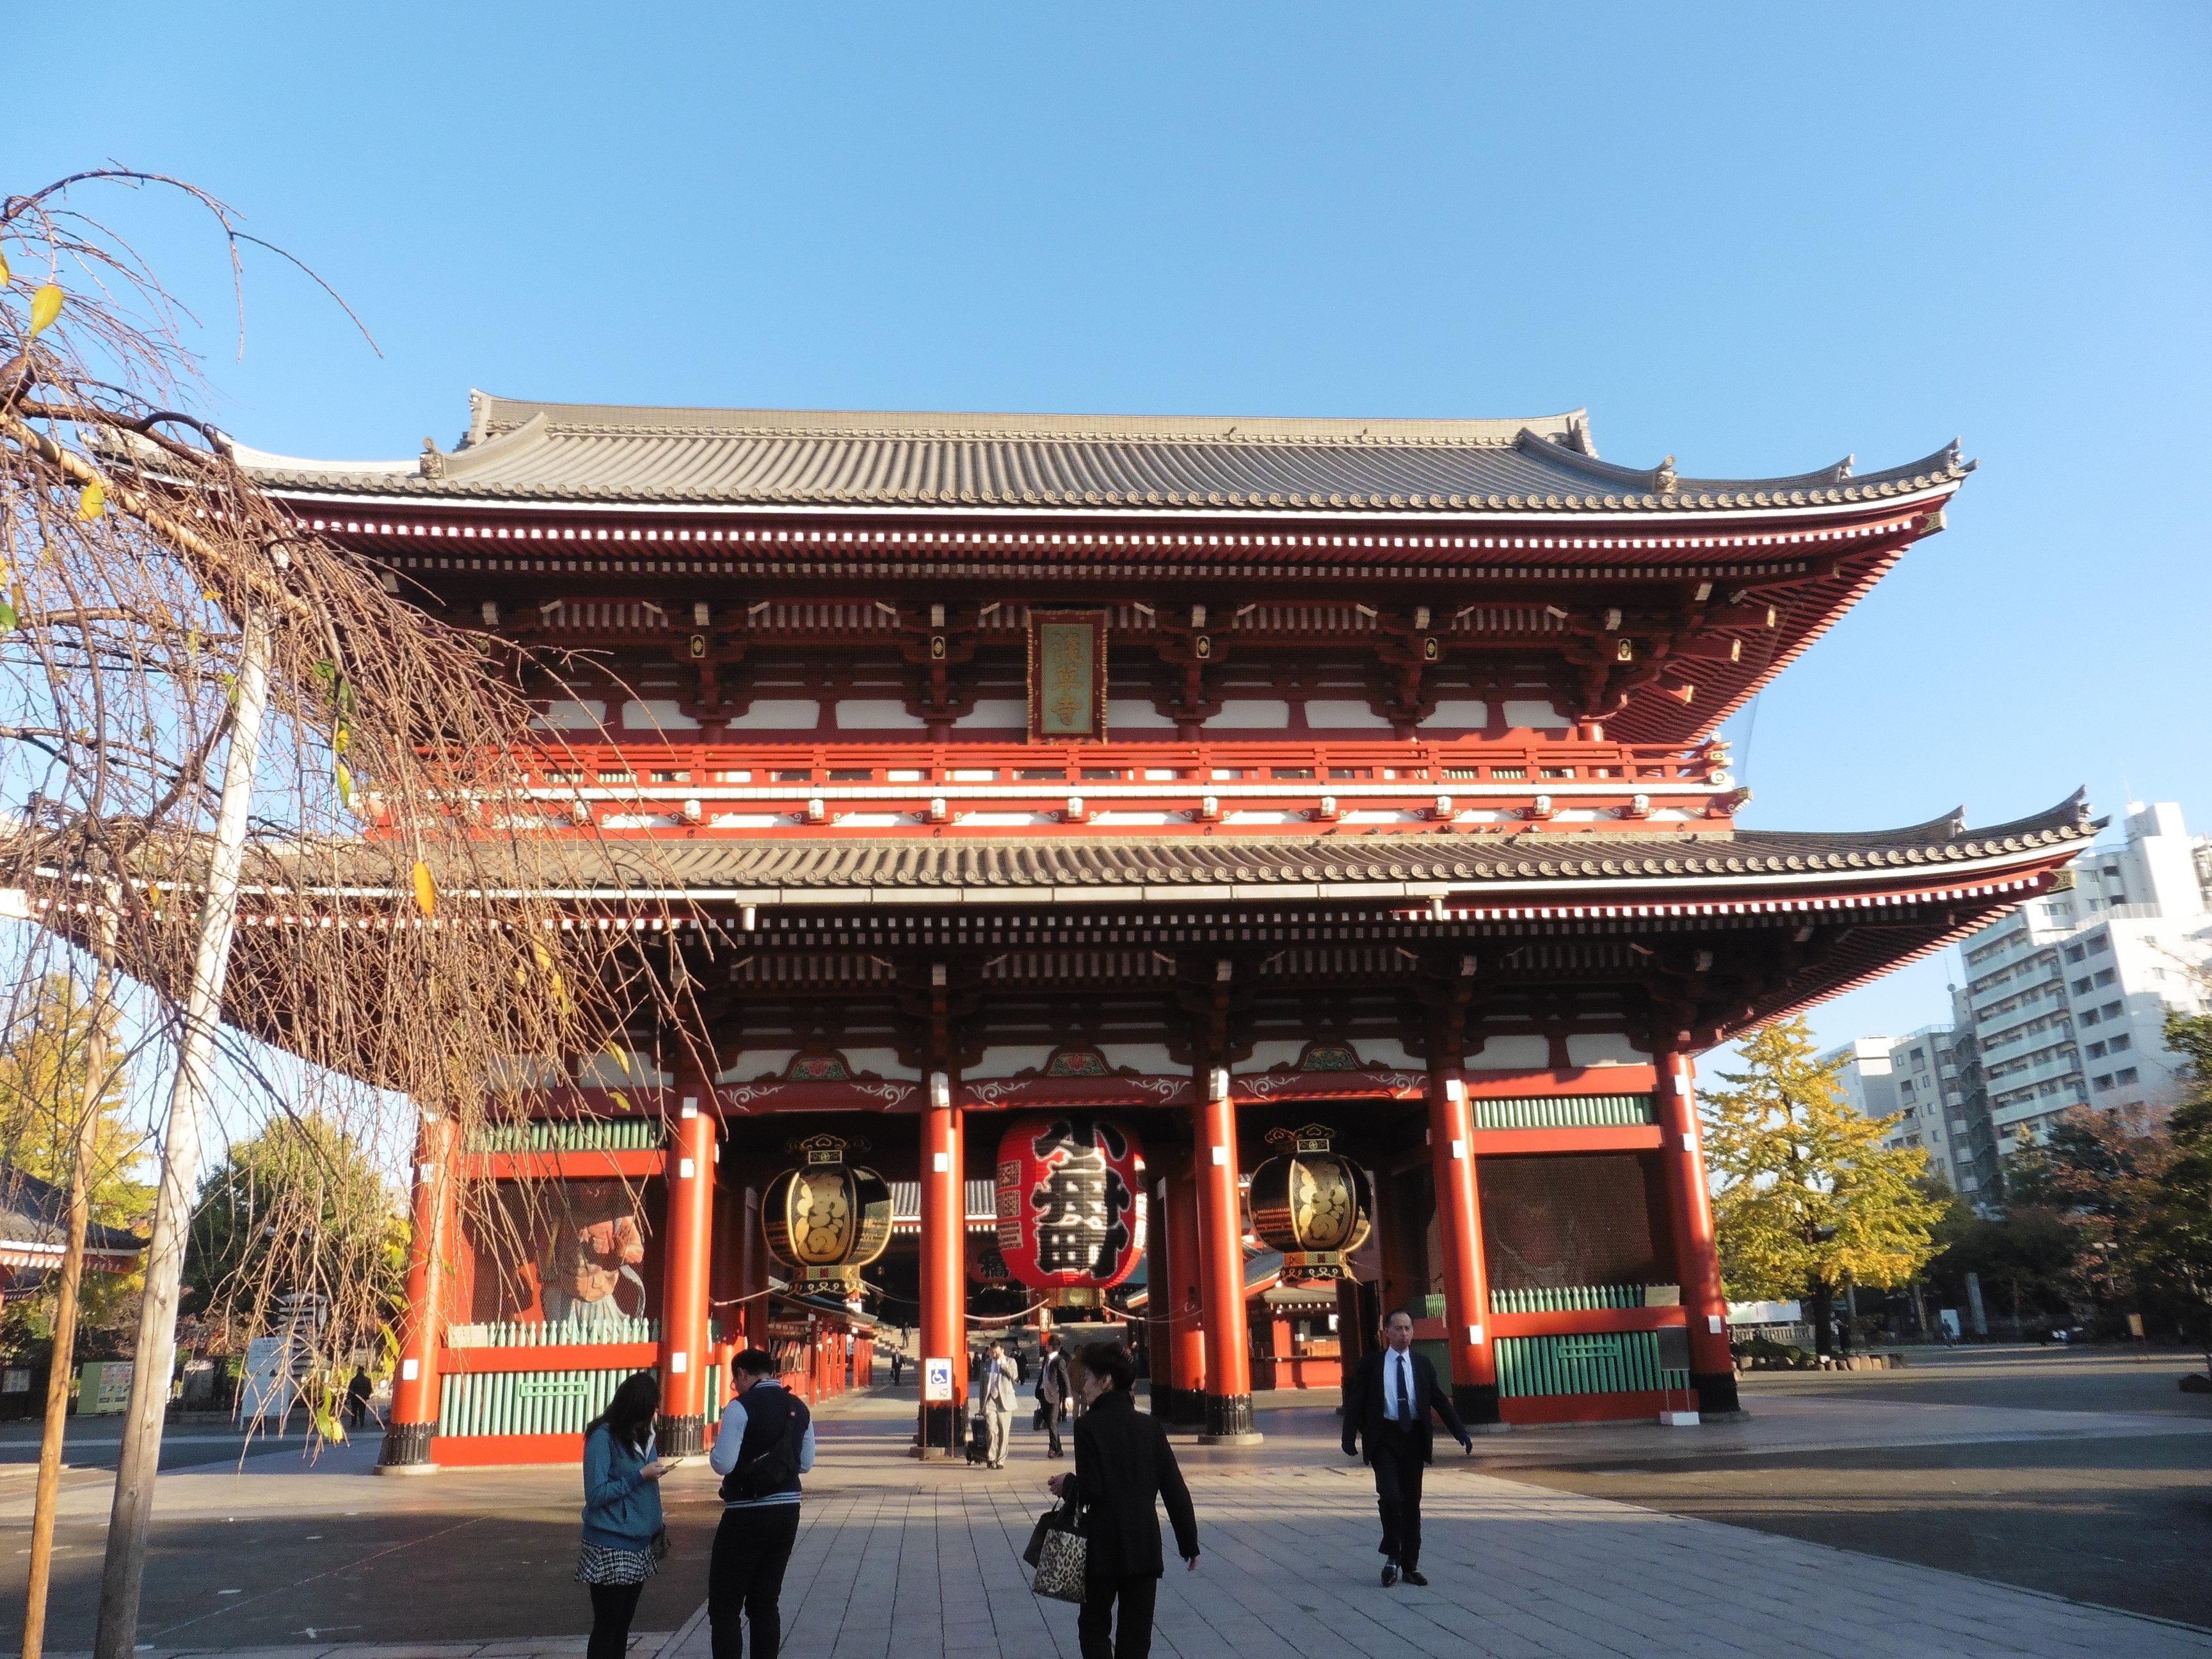 Nearby Senso-ji temple